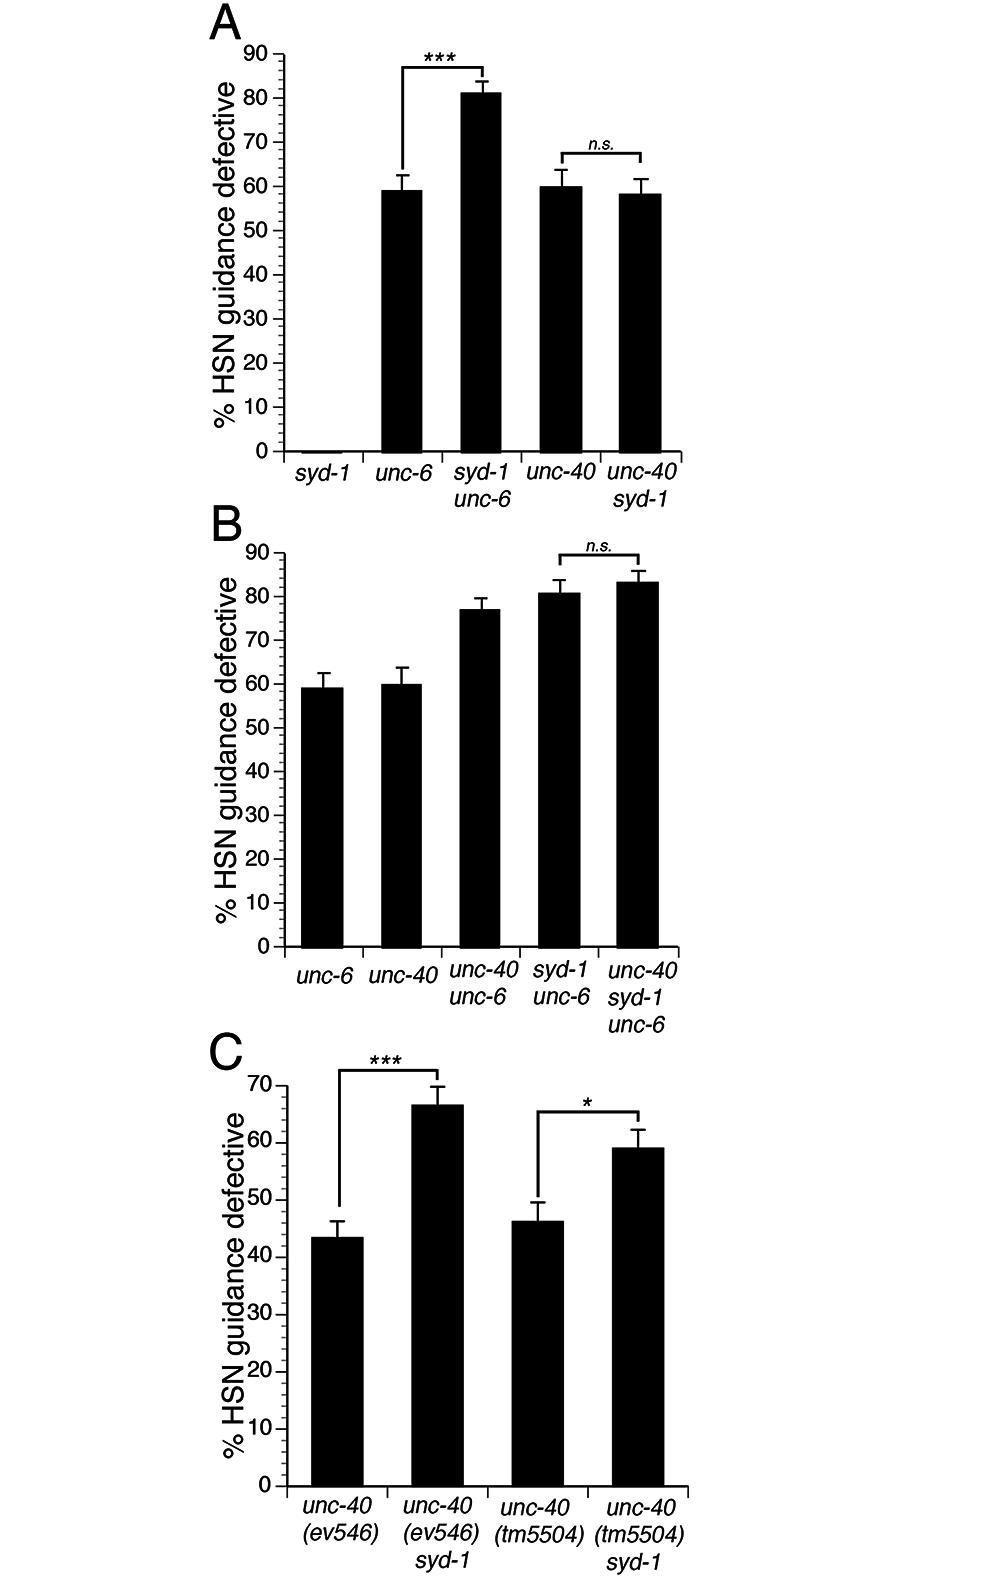 SYD-1 mediates UNC-6 independent UNC-40 signaling.